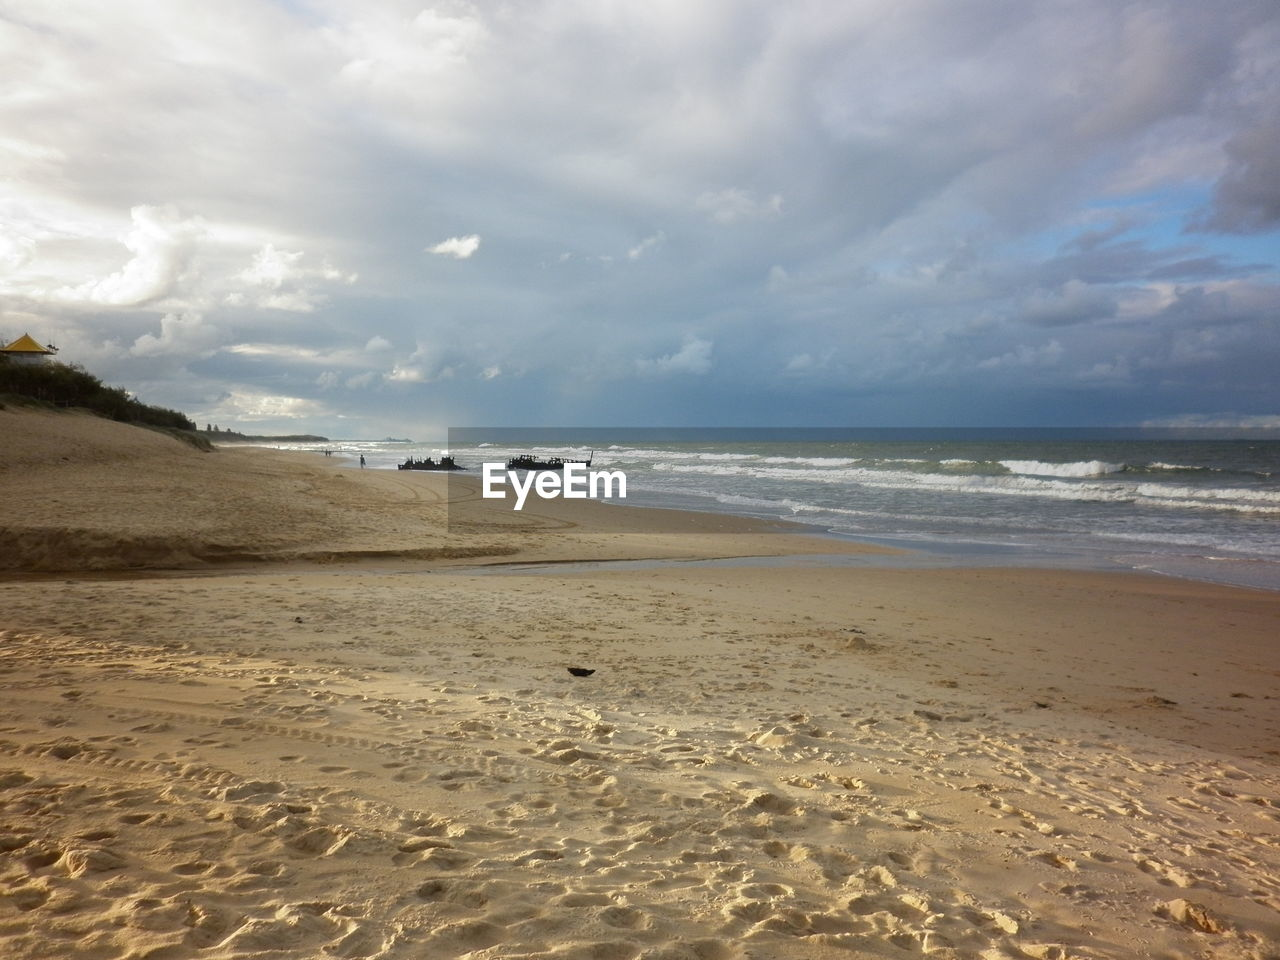 Landscape of cloudy beach